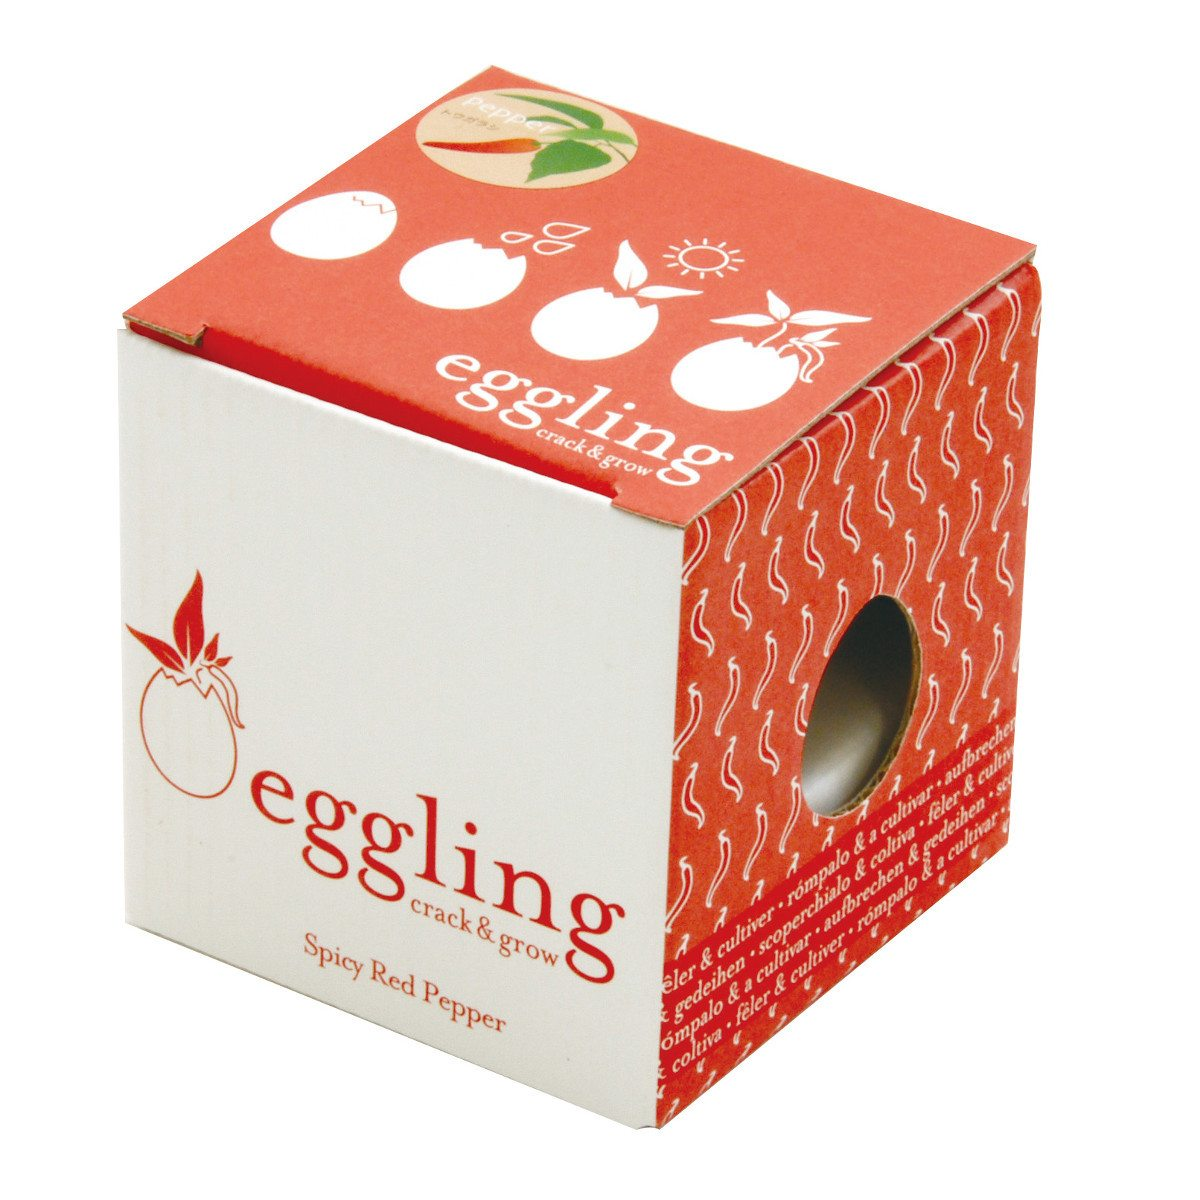 Eggling-plante